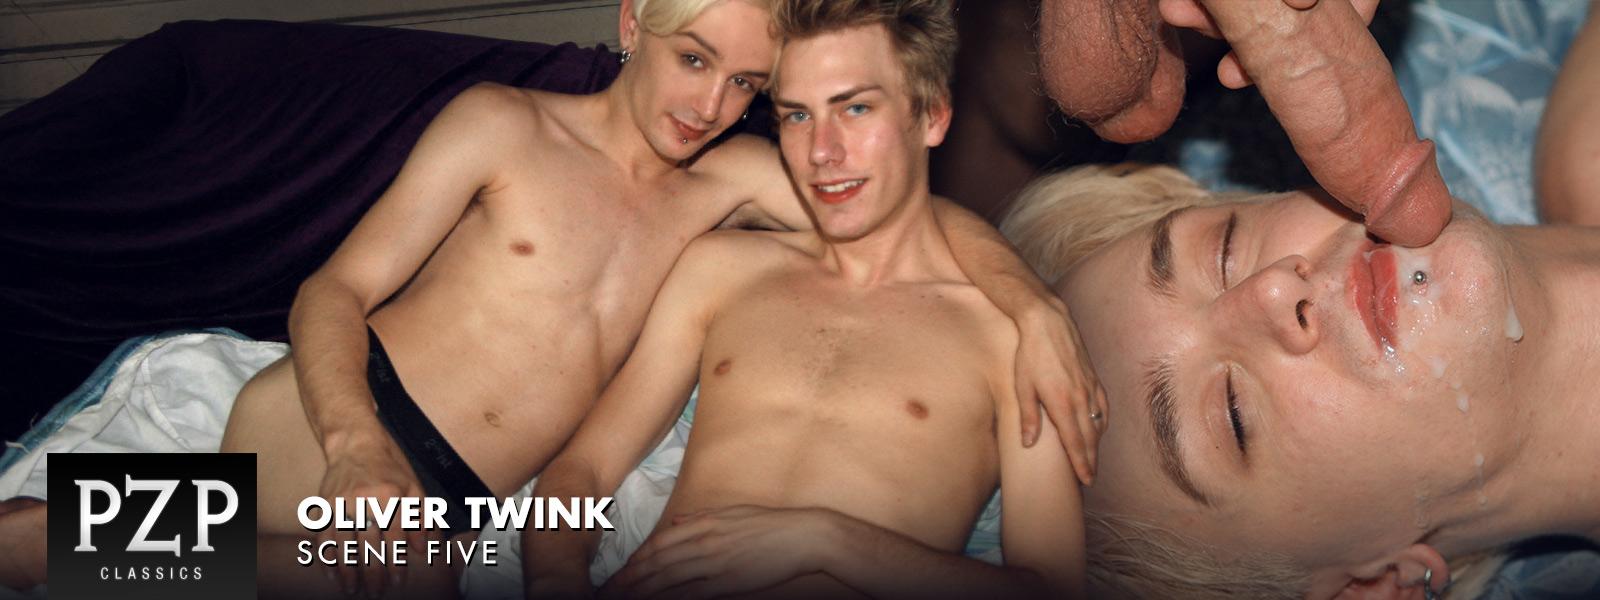 Oliver Twink | Scene Five